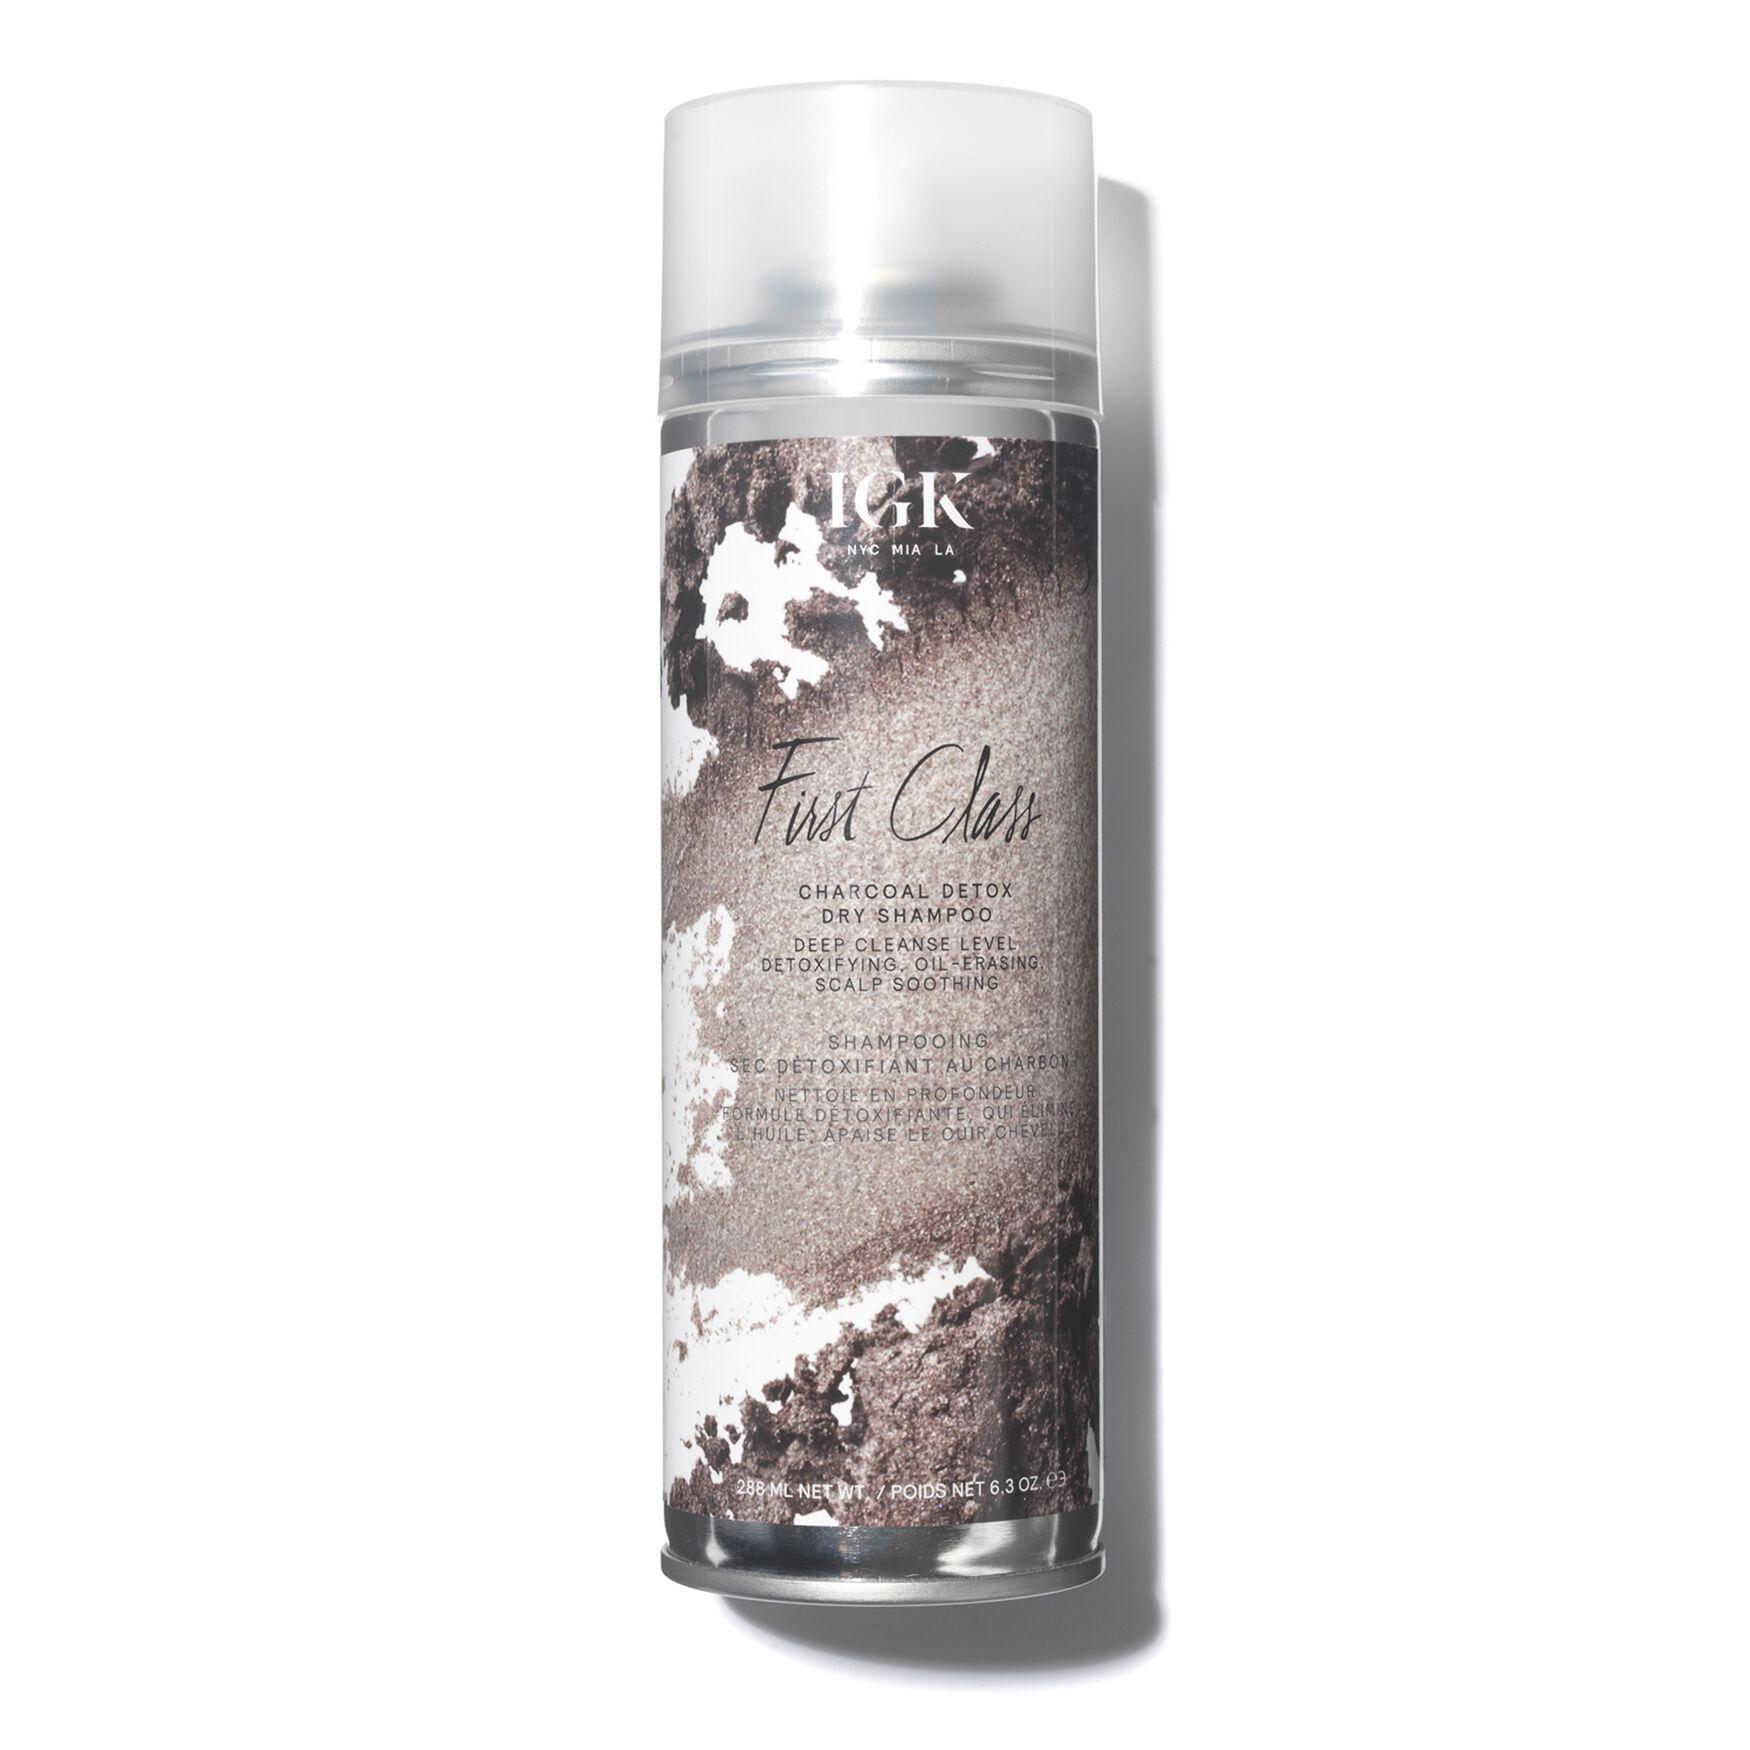 IGK | First Class Charcoal Detox Dry Shampoo